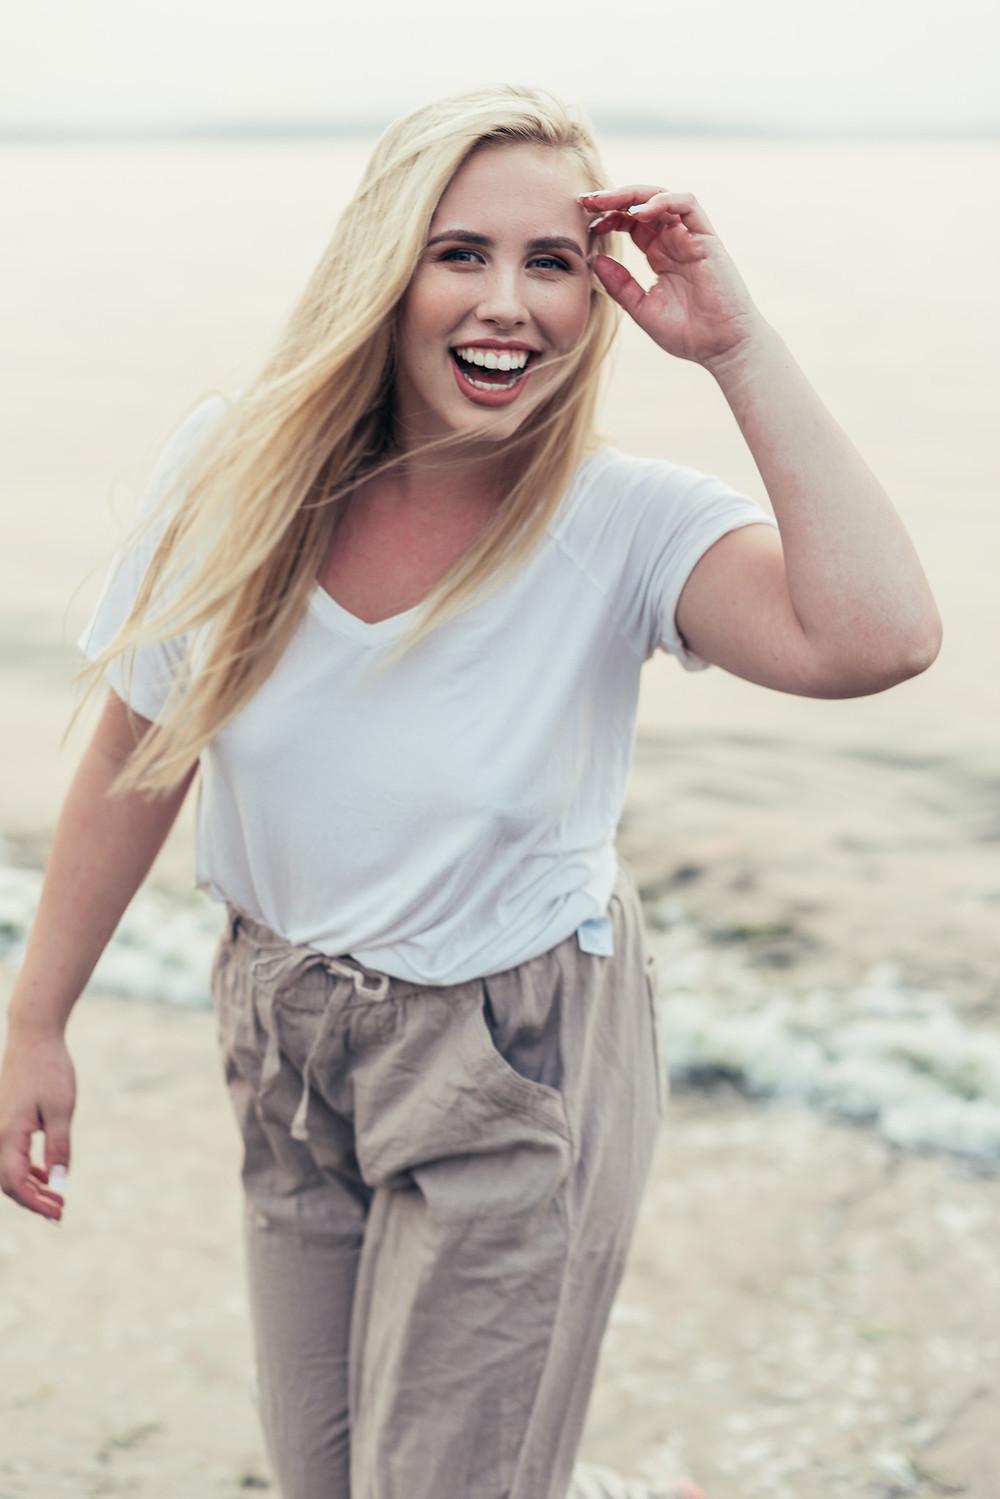 Sarah Coie laughing